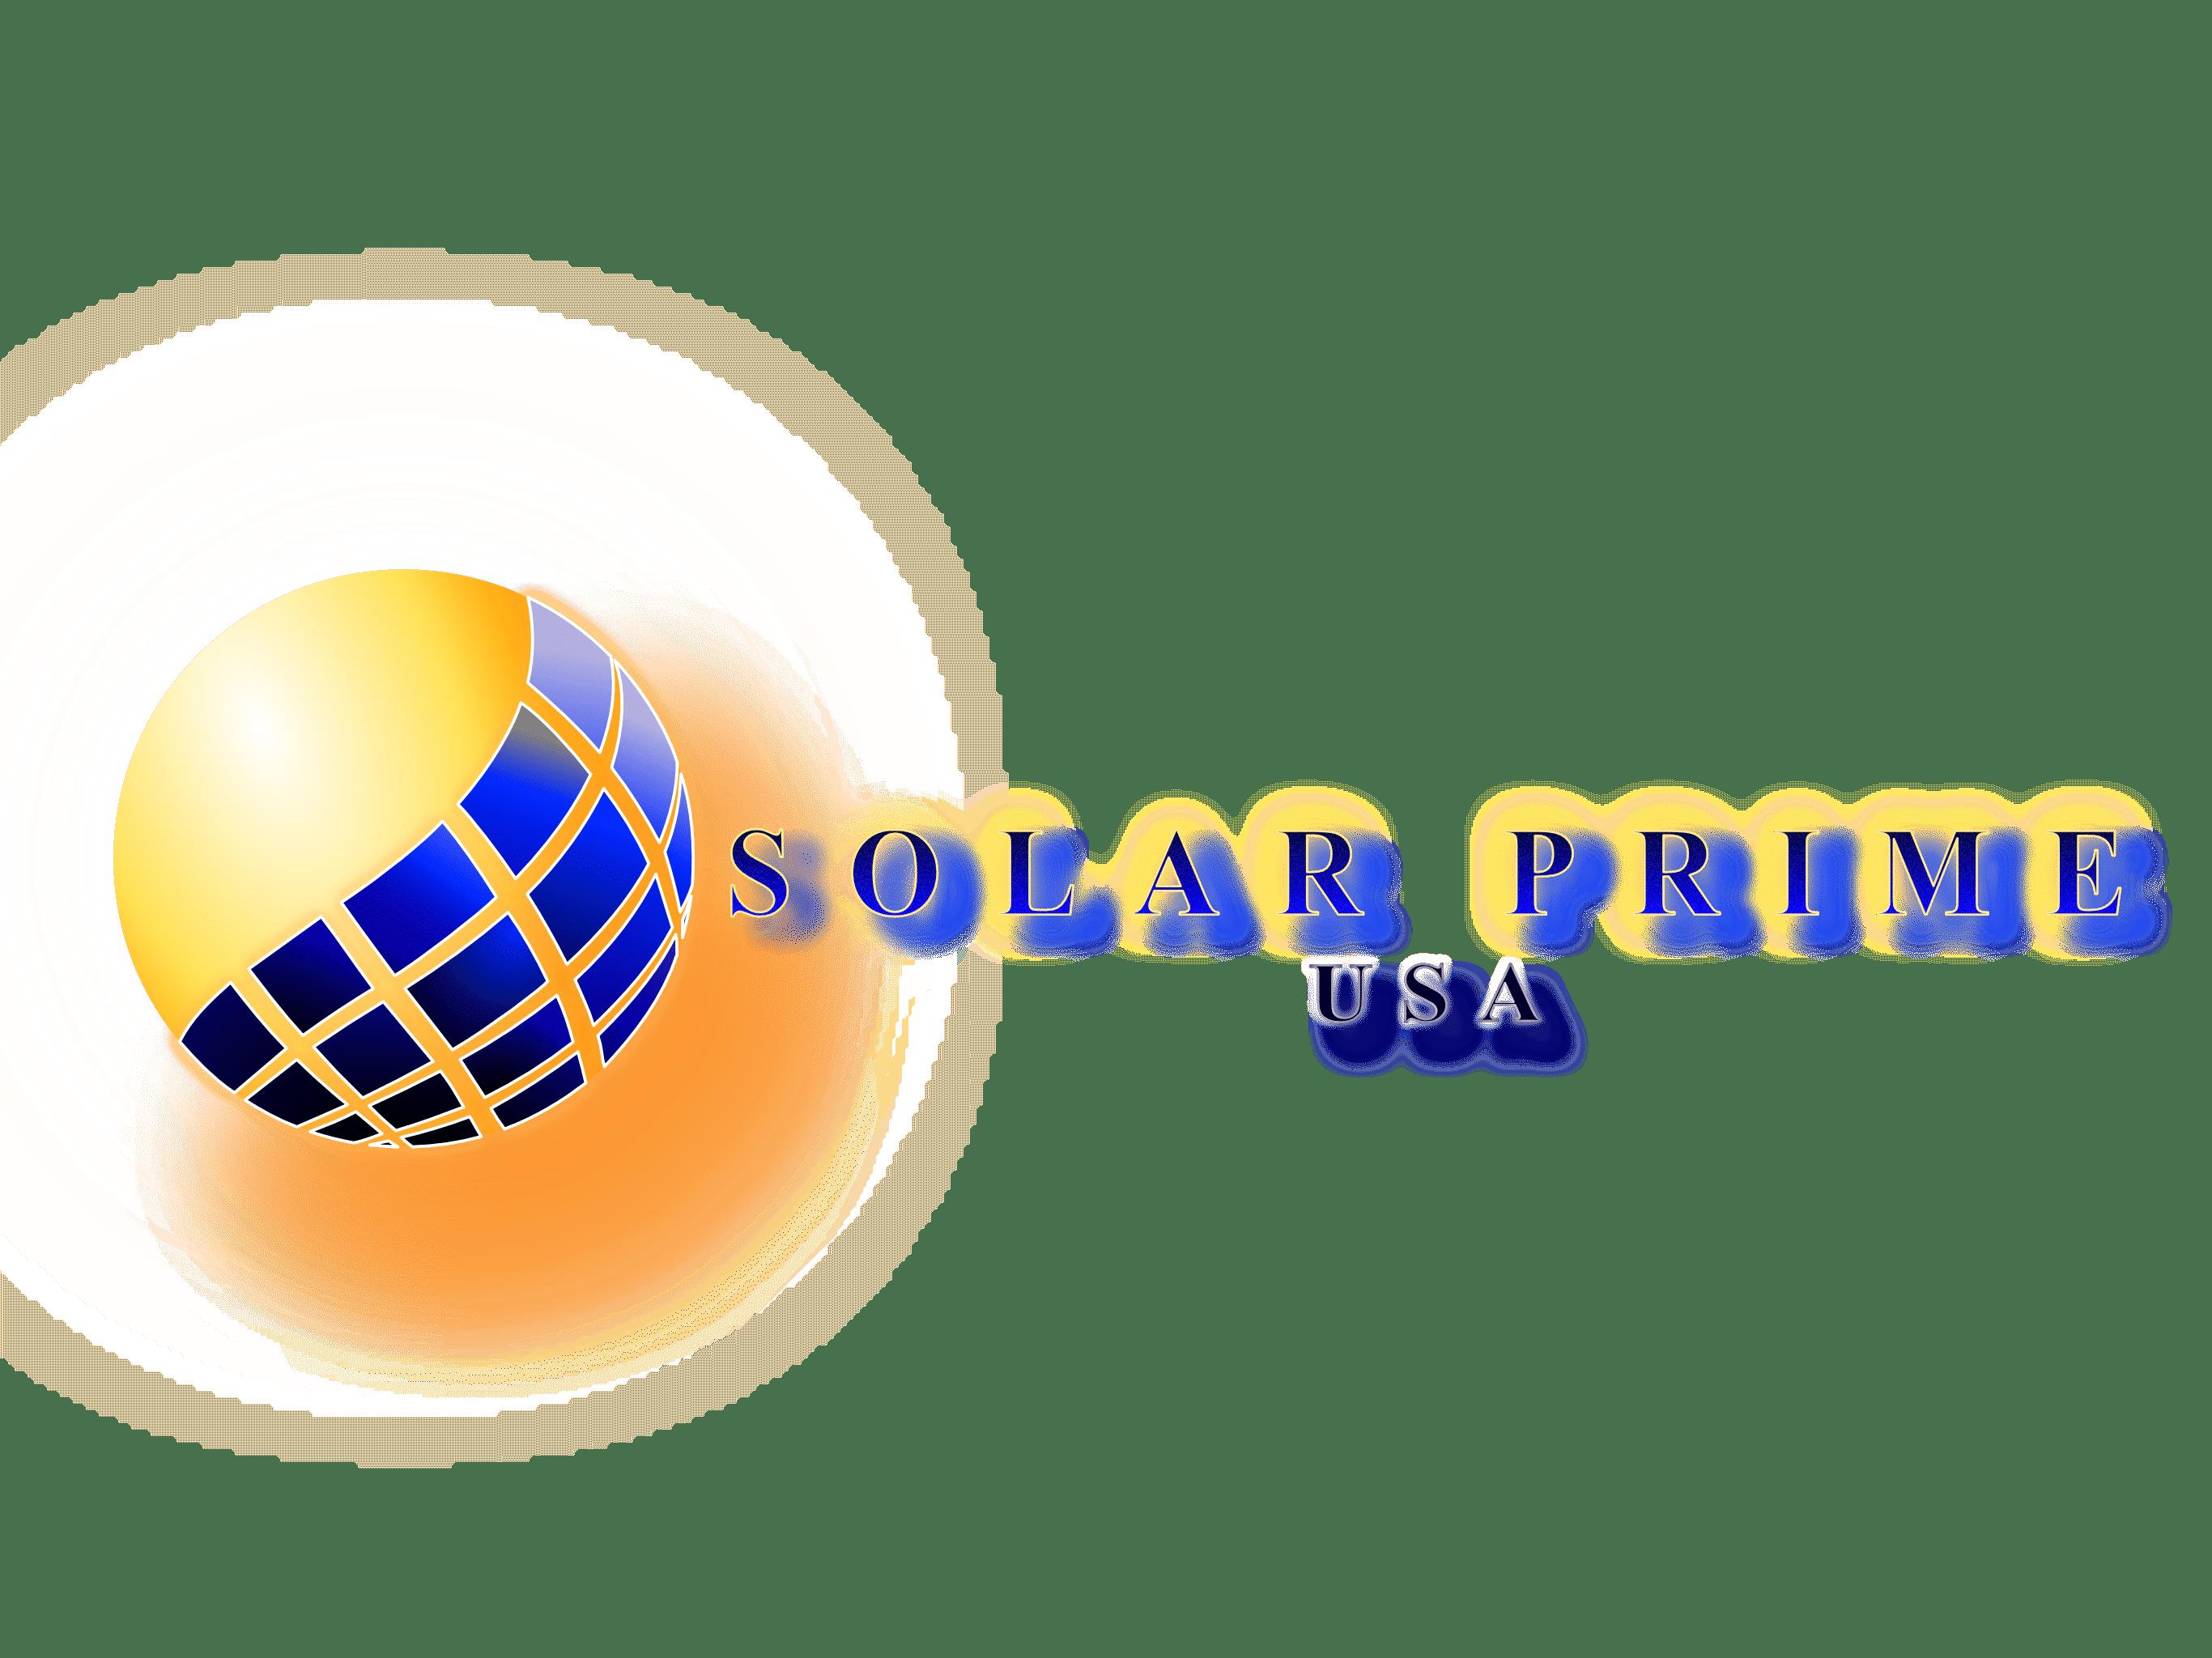 Solar Prime USA